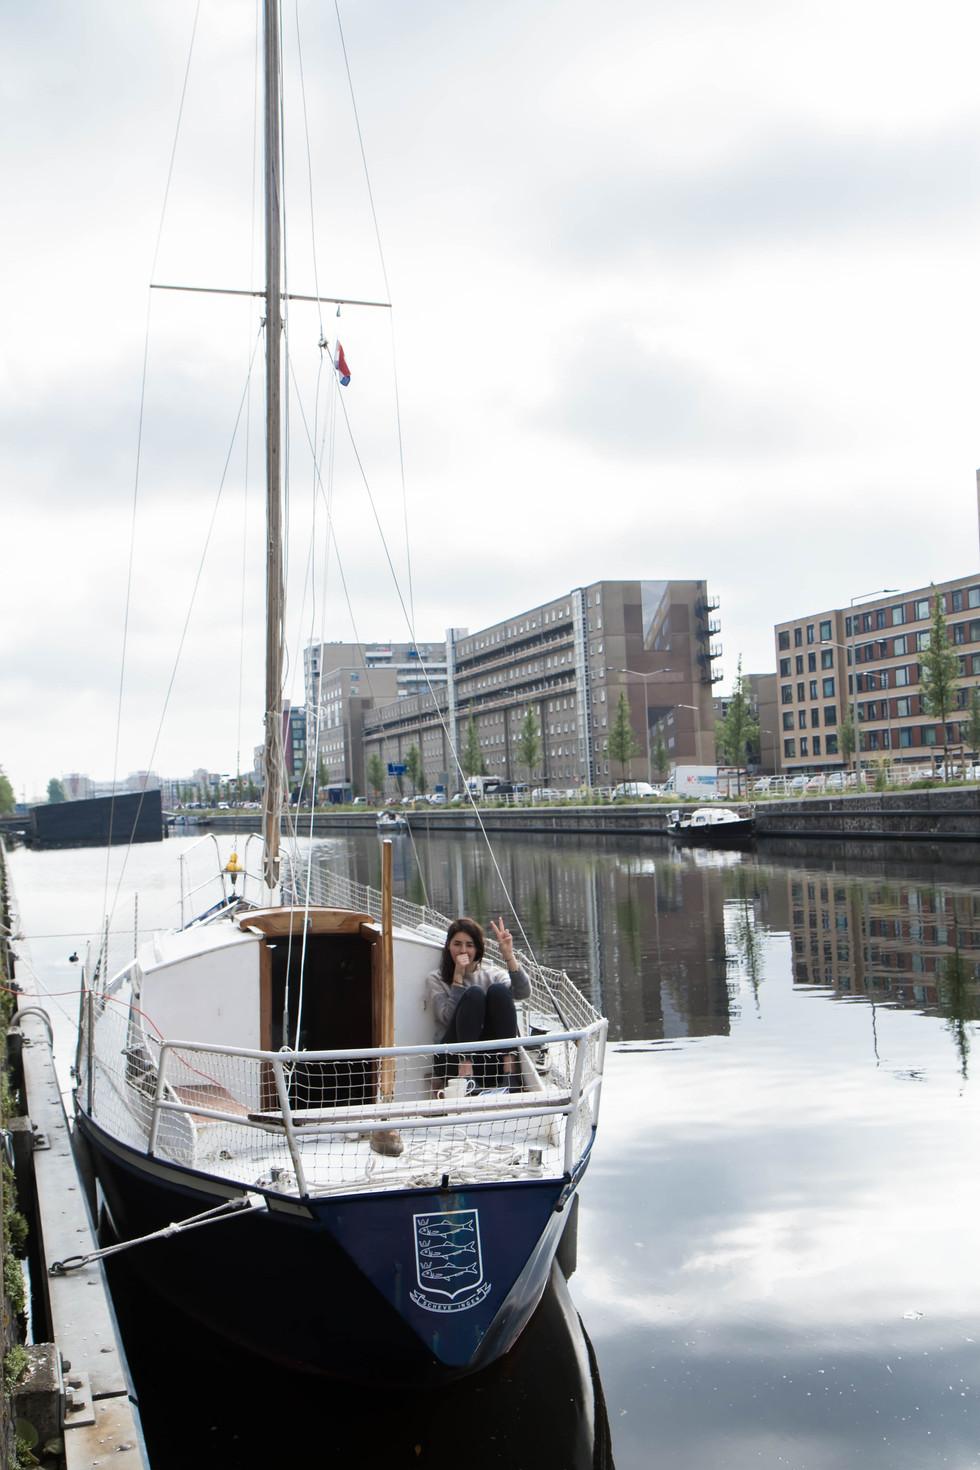 Habitant des canaux - La Haye